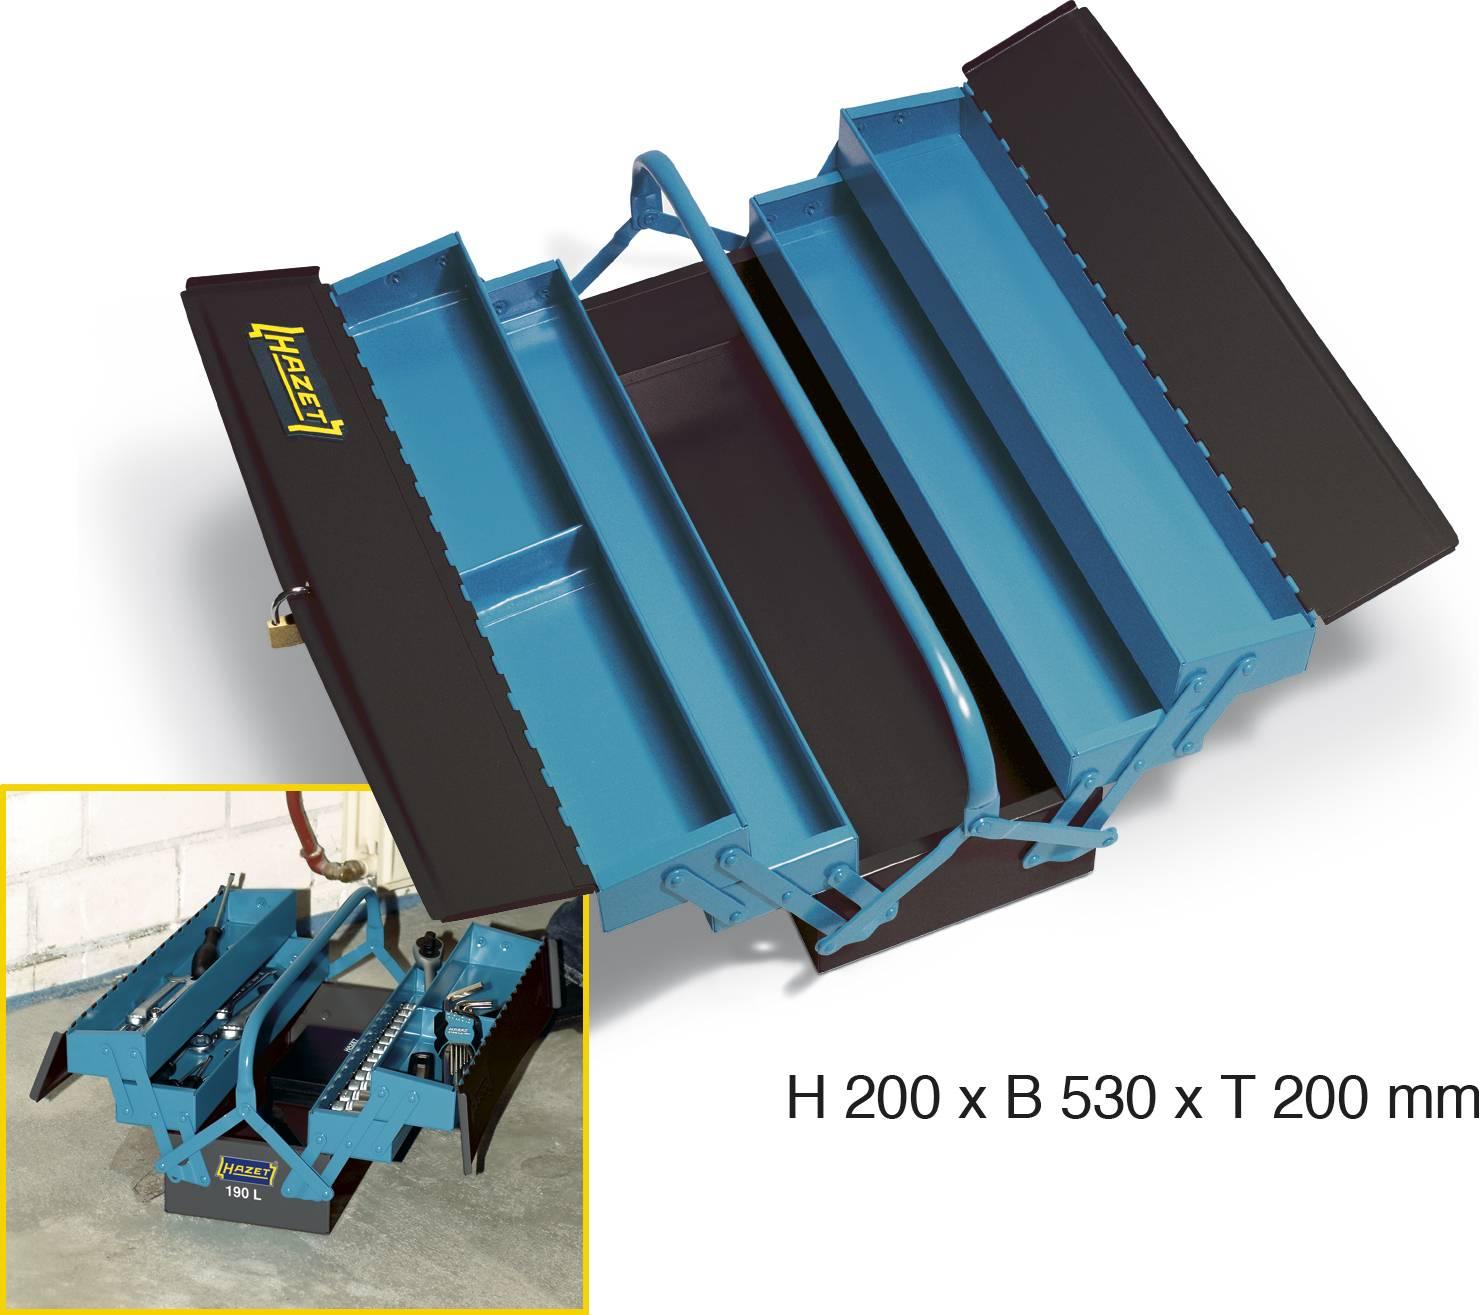 Basa na nářadí Hazet 190L, 530 x 200 x 200 mm